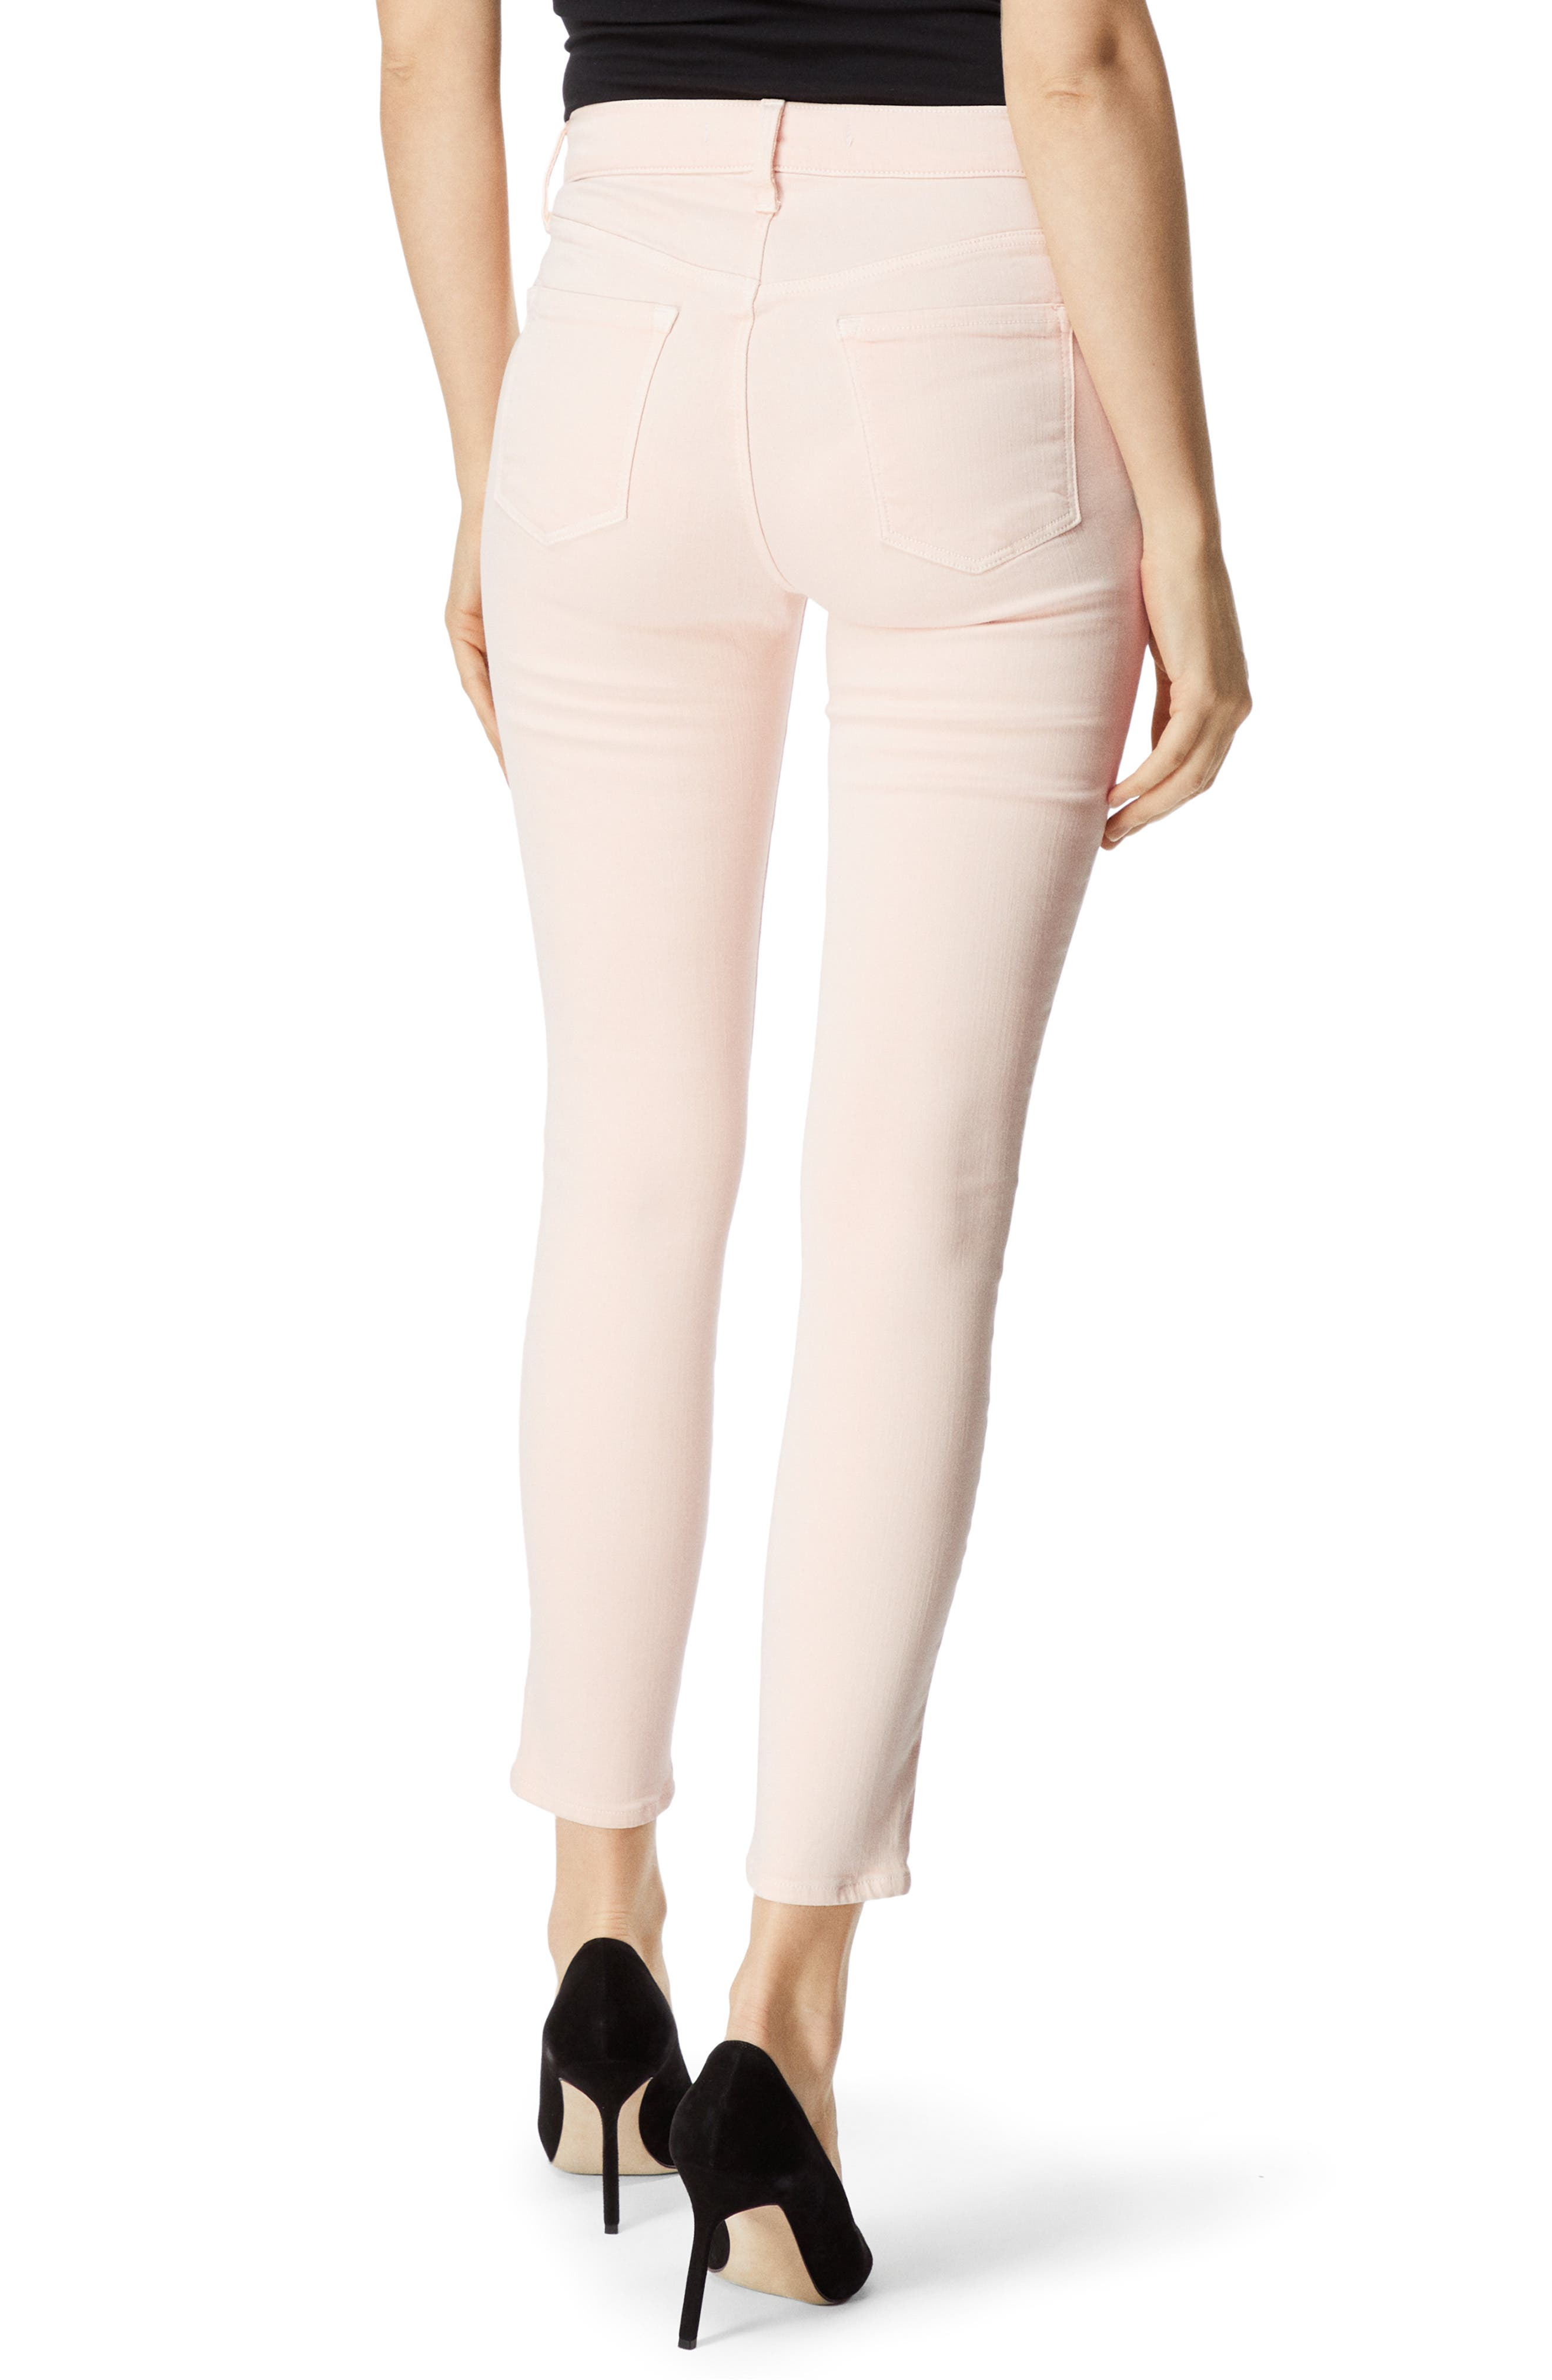 J BRAND, Alana High Waist Ankle Skinny Jeans, Alternate thumbnail 2, color, 684